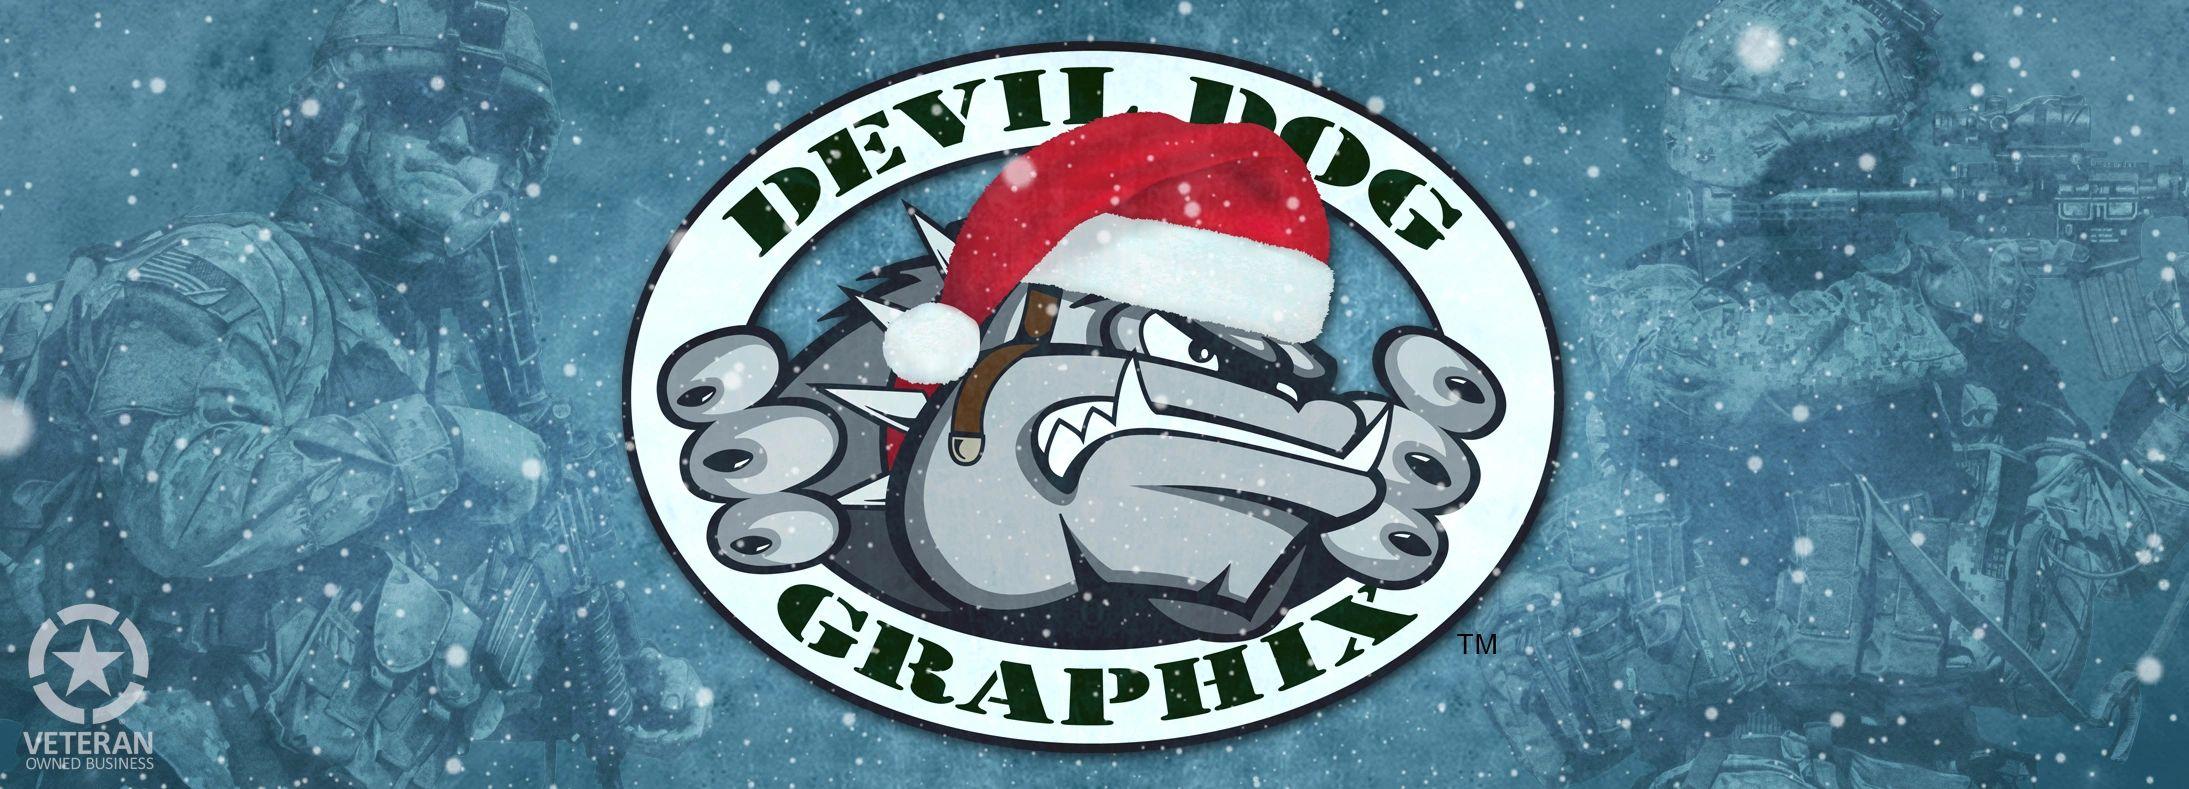 Devil Dog Graphix Graphic Design Apparel Graphics